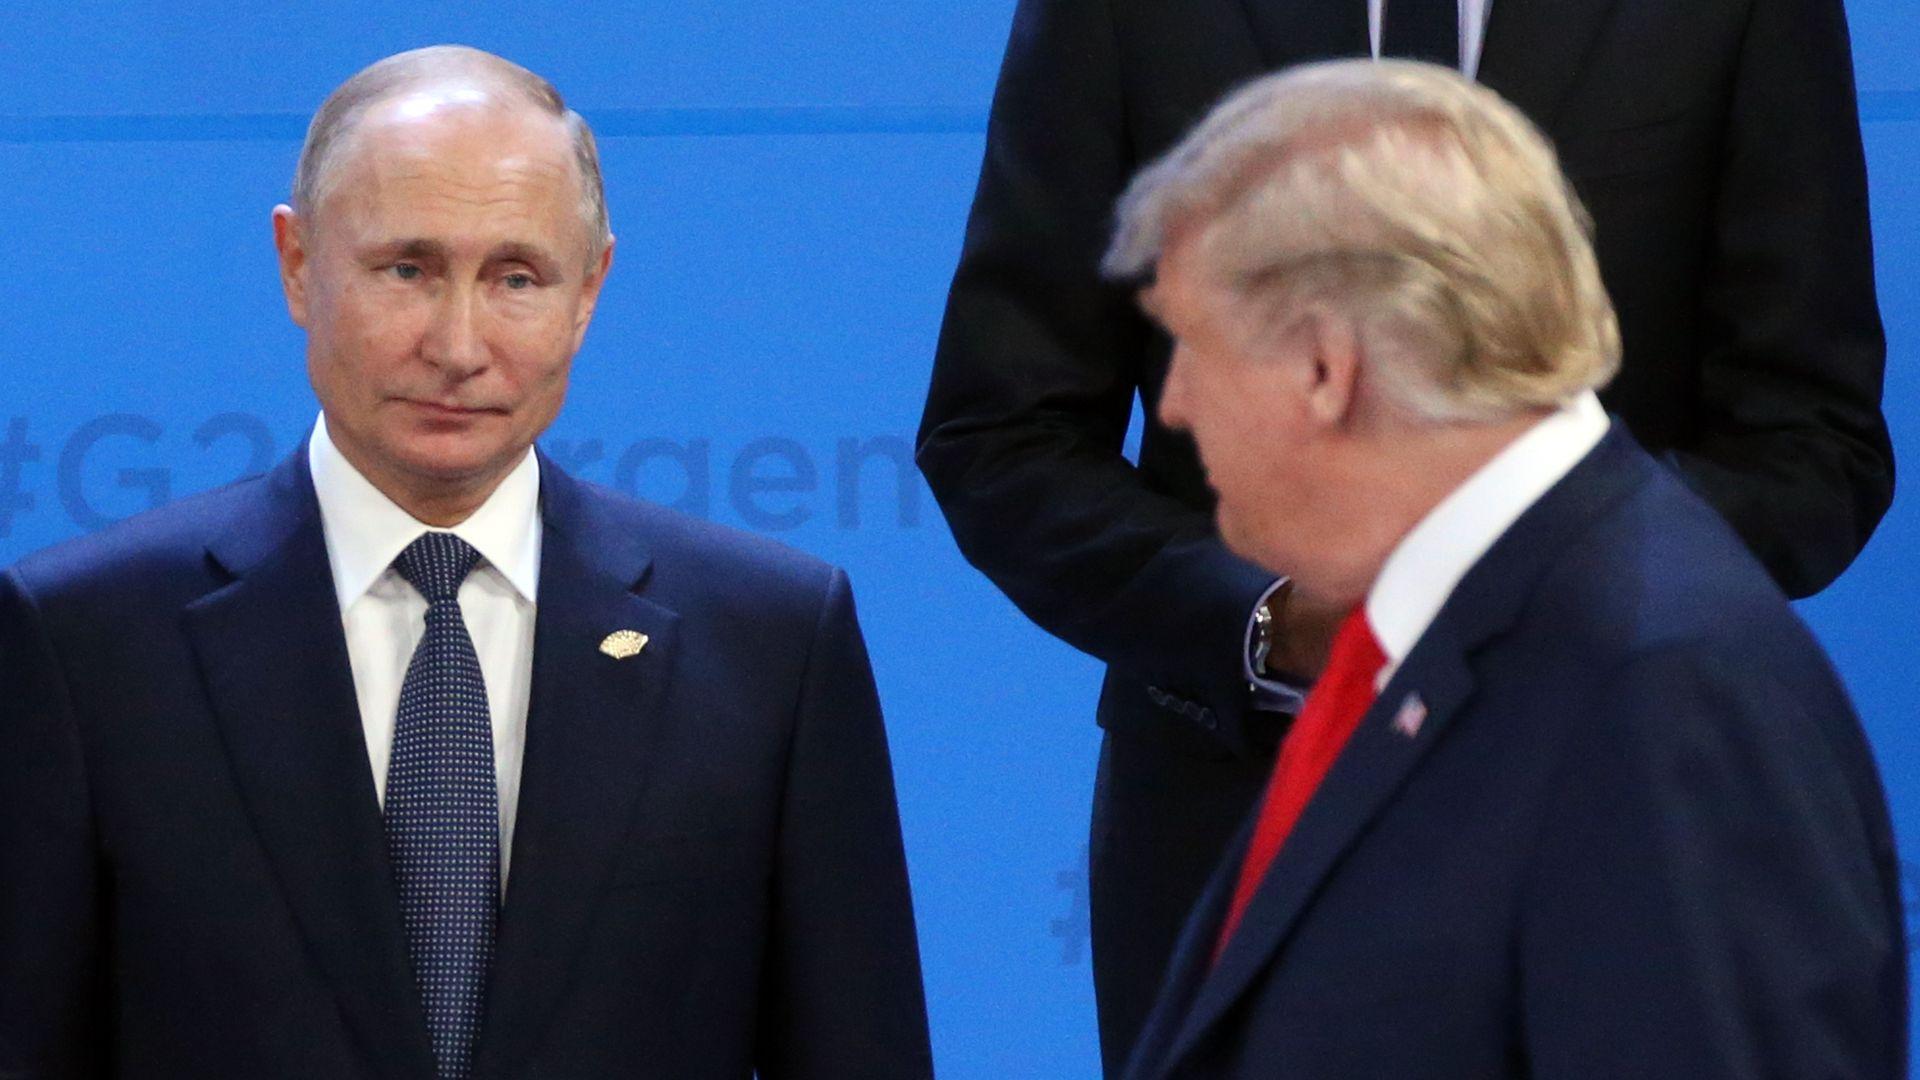 Trump and Putin at the 2018 G20 plenery